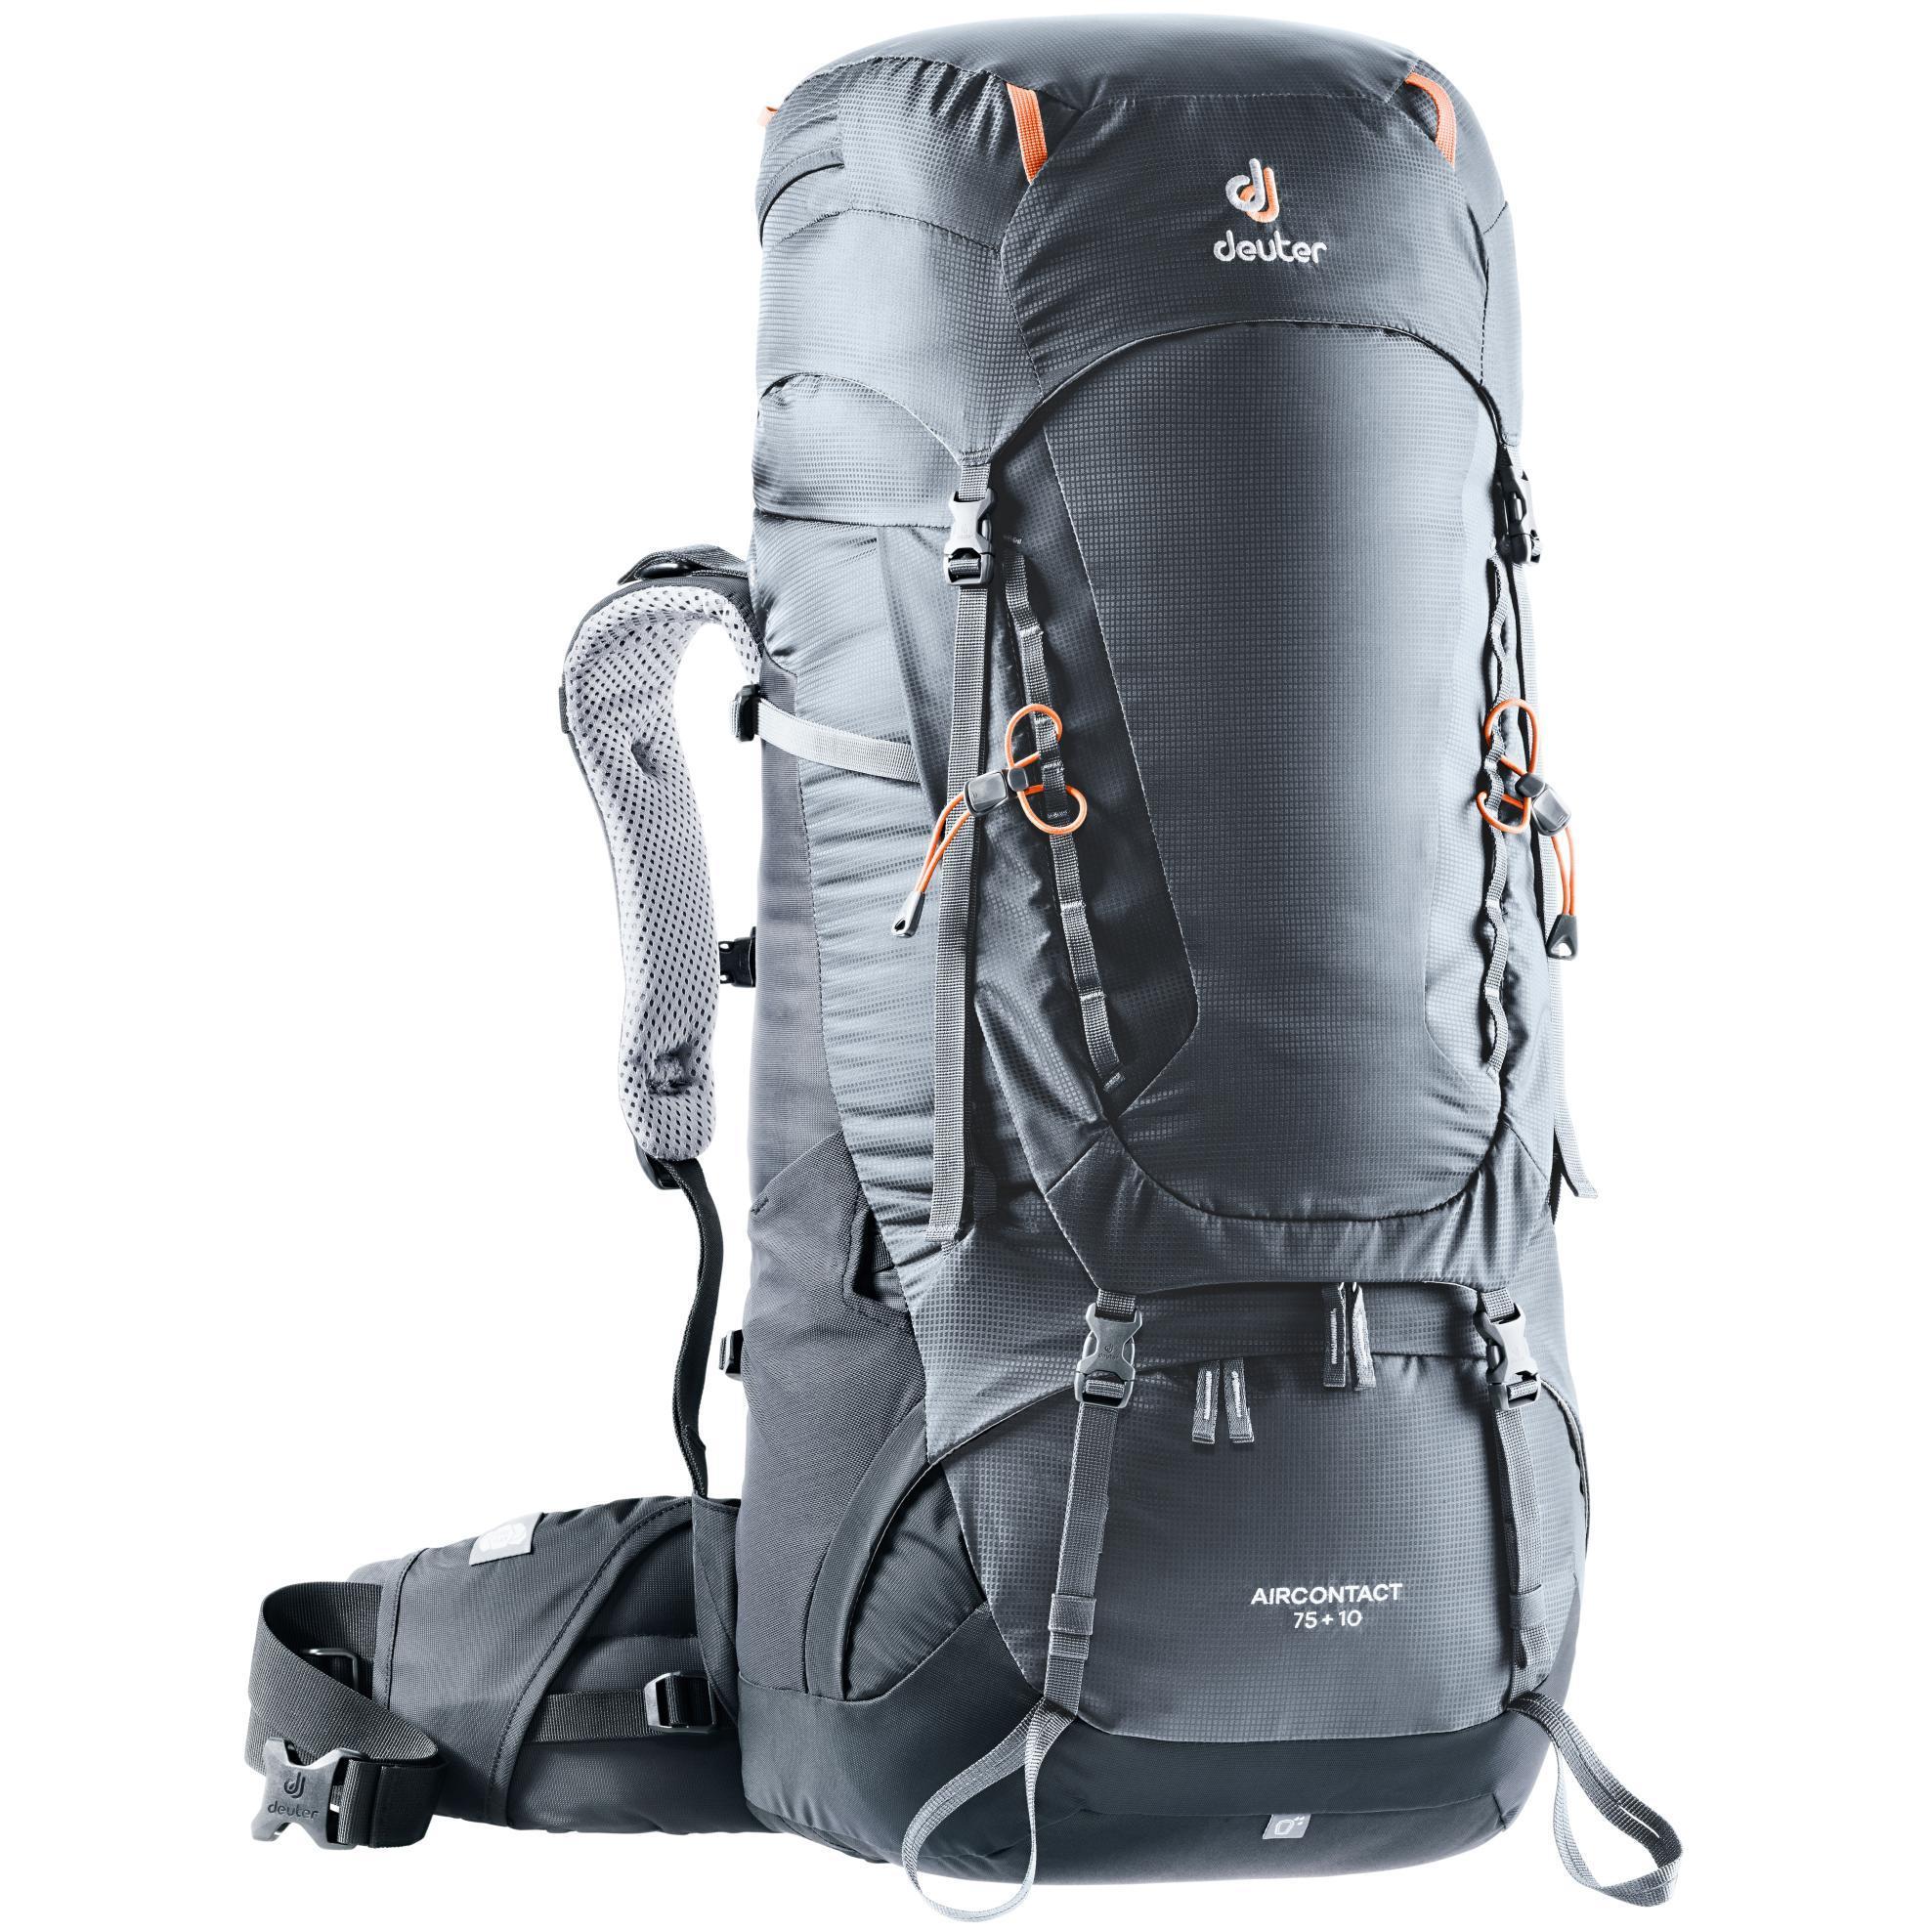 Туристические рюкзаки большие Рюкзак Deuter Aircontact 75 + 10 (2020) cf74060f496d2d03d812a936bec97e4a.jpg